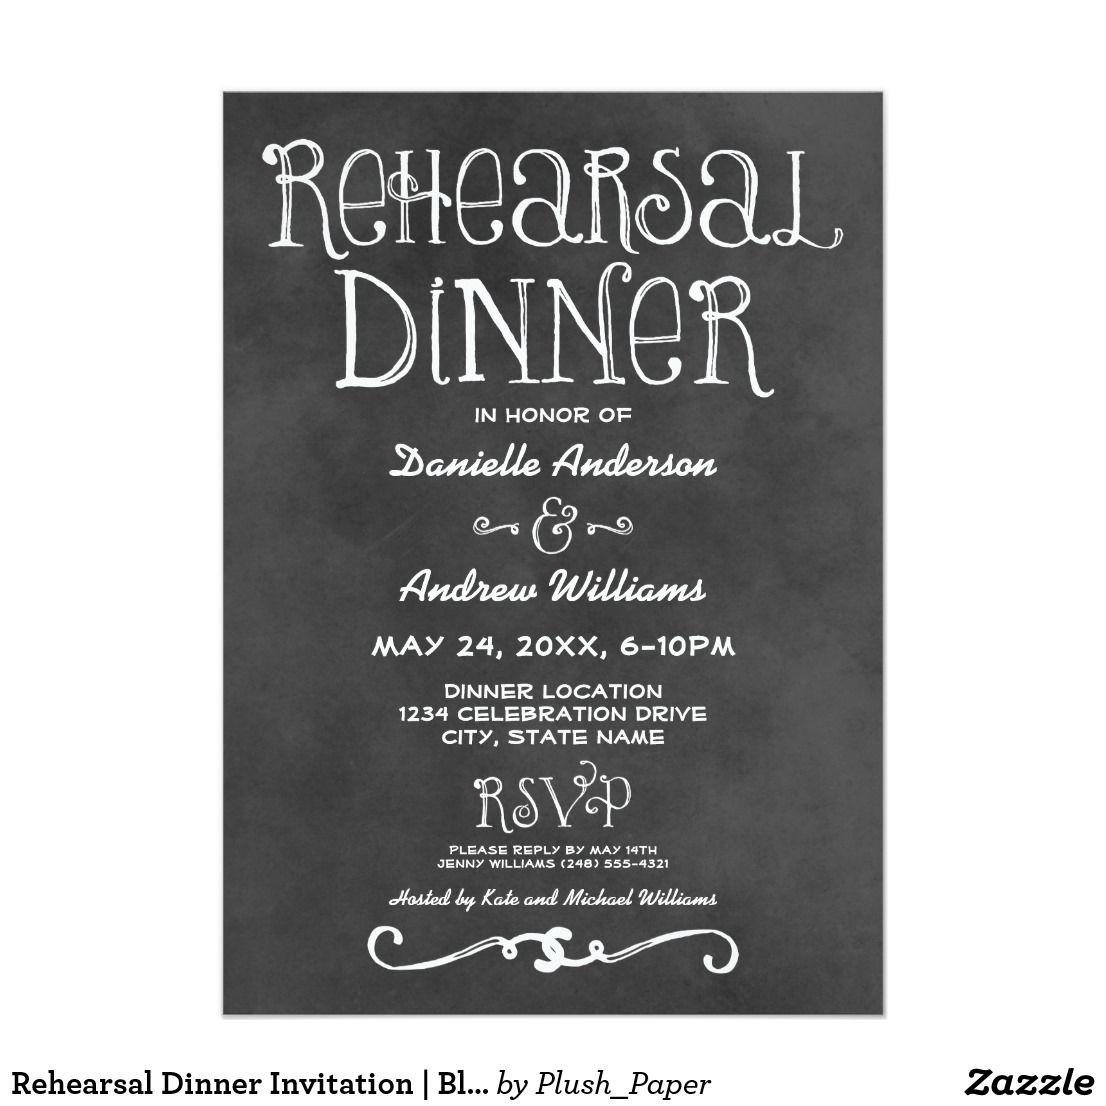 rehearsal dinner invitation black chalkboard charming chalkboard